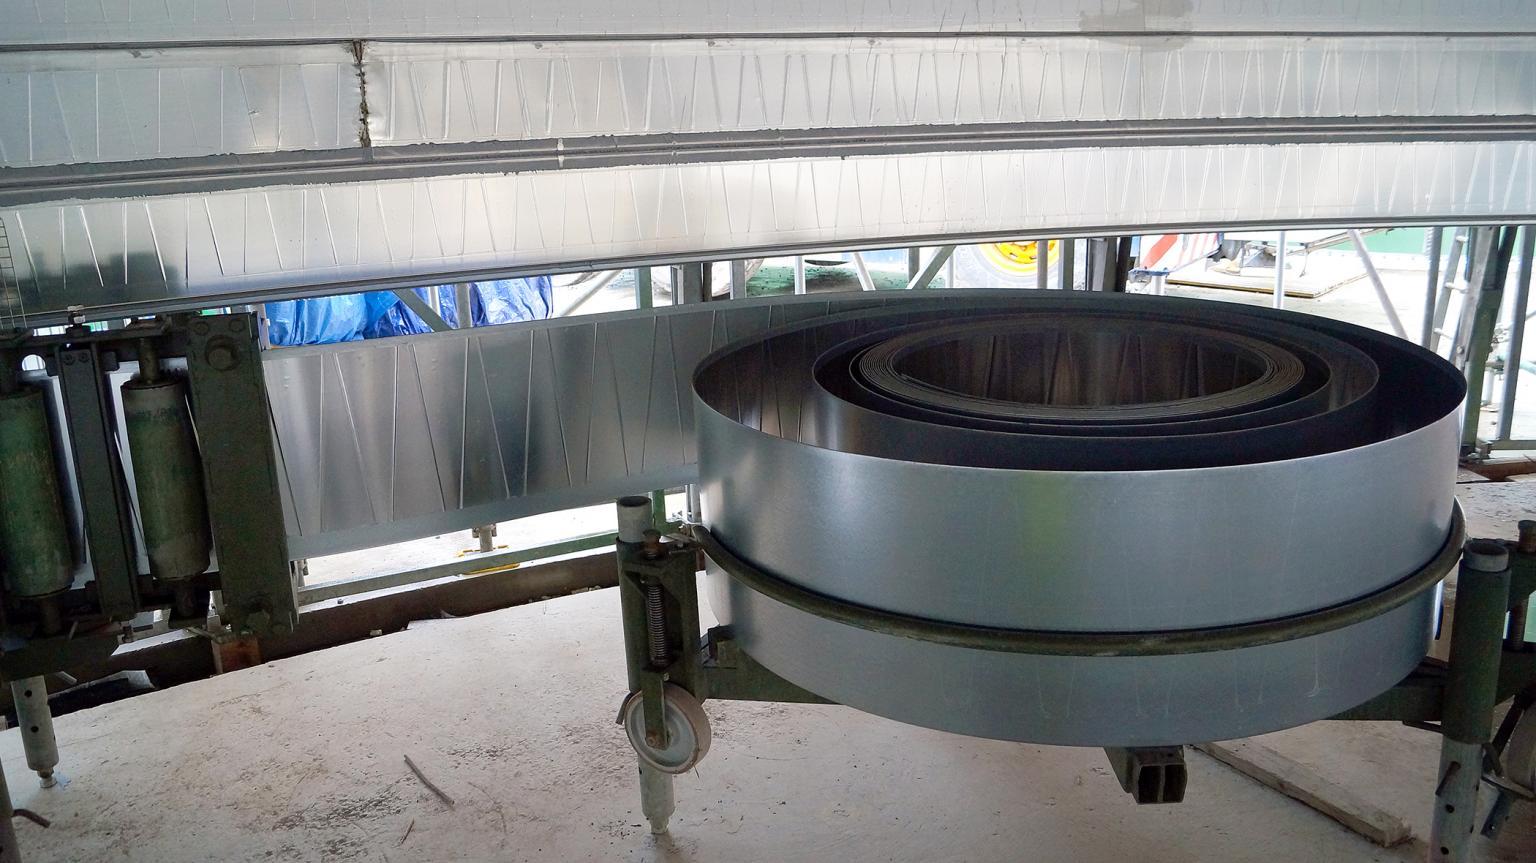 Lipp Verinox steel band coil feed